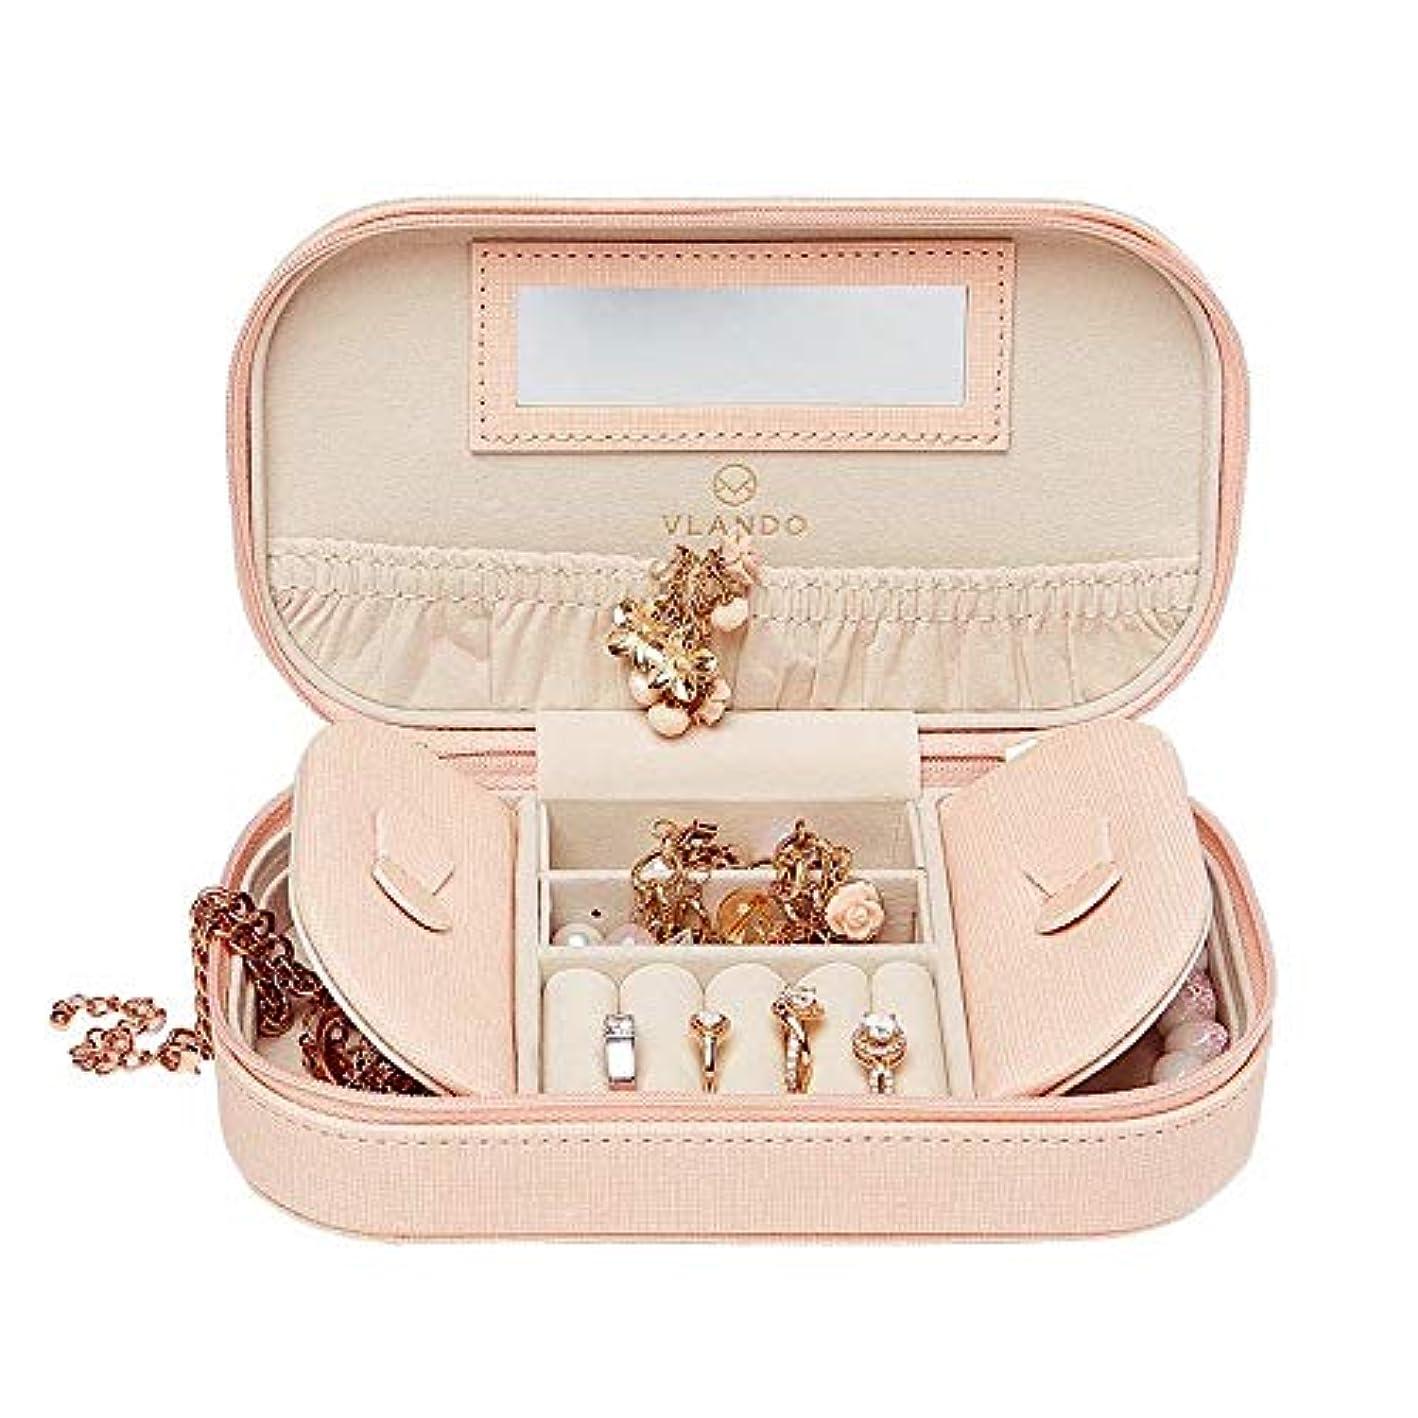 Vlando Travel Tassel Jewelry Box Organizer - Woman Girls Faux Leather Necklace Earrings Rings Organizer Holder (Pink)